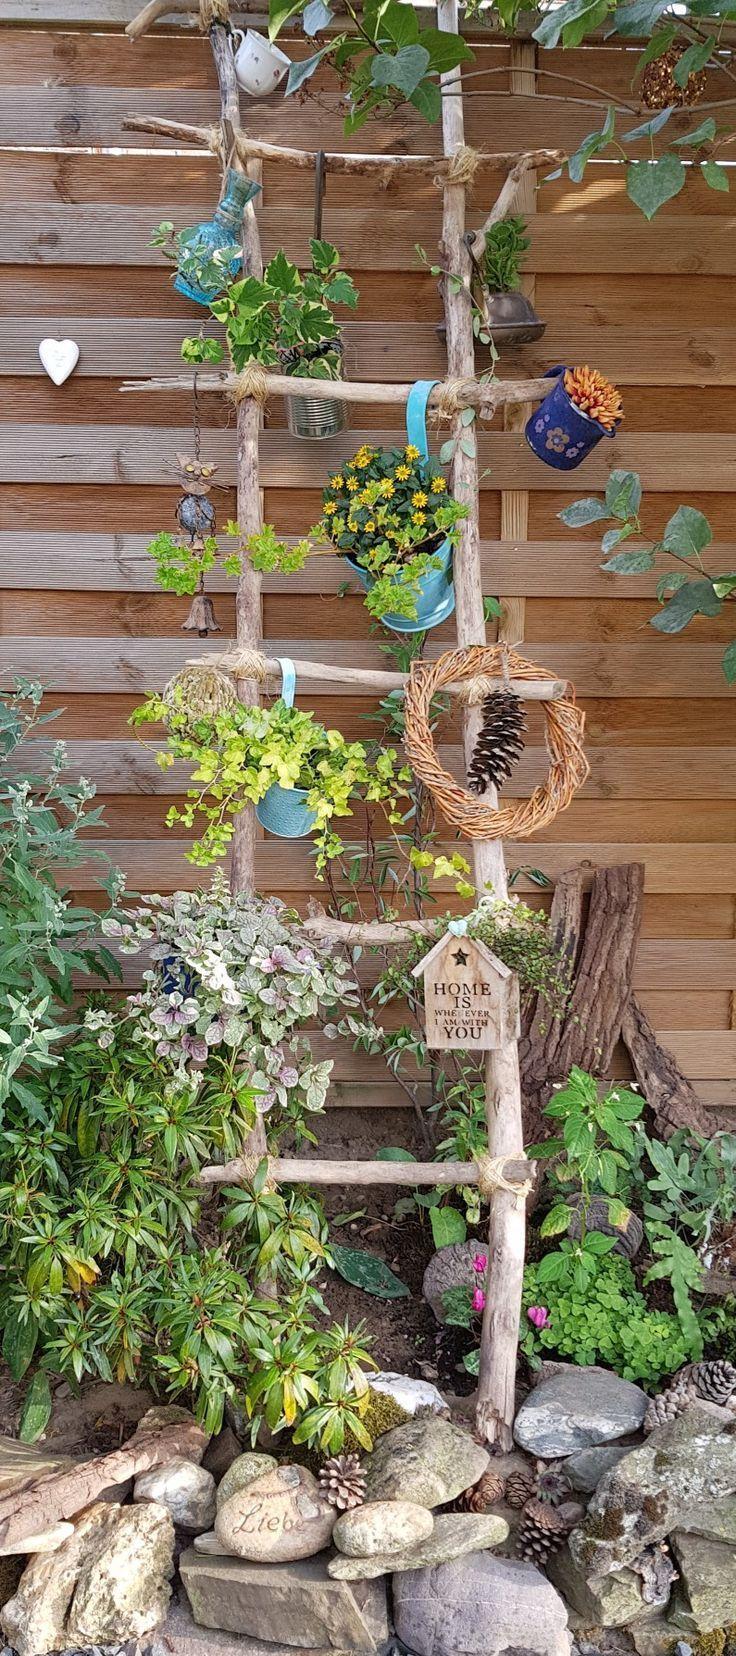 Driftwood Treibholz Another Machen All Alles Kann Idea Mit Man Was For Sowas Man Alles So Mit Gartengestaltung Ideen Gartendesign Ideen Garten